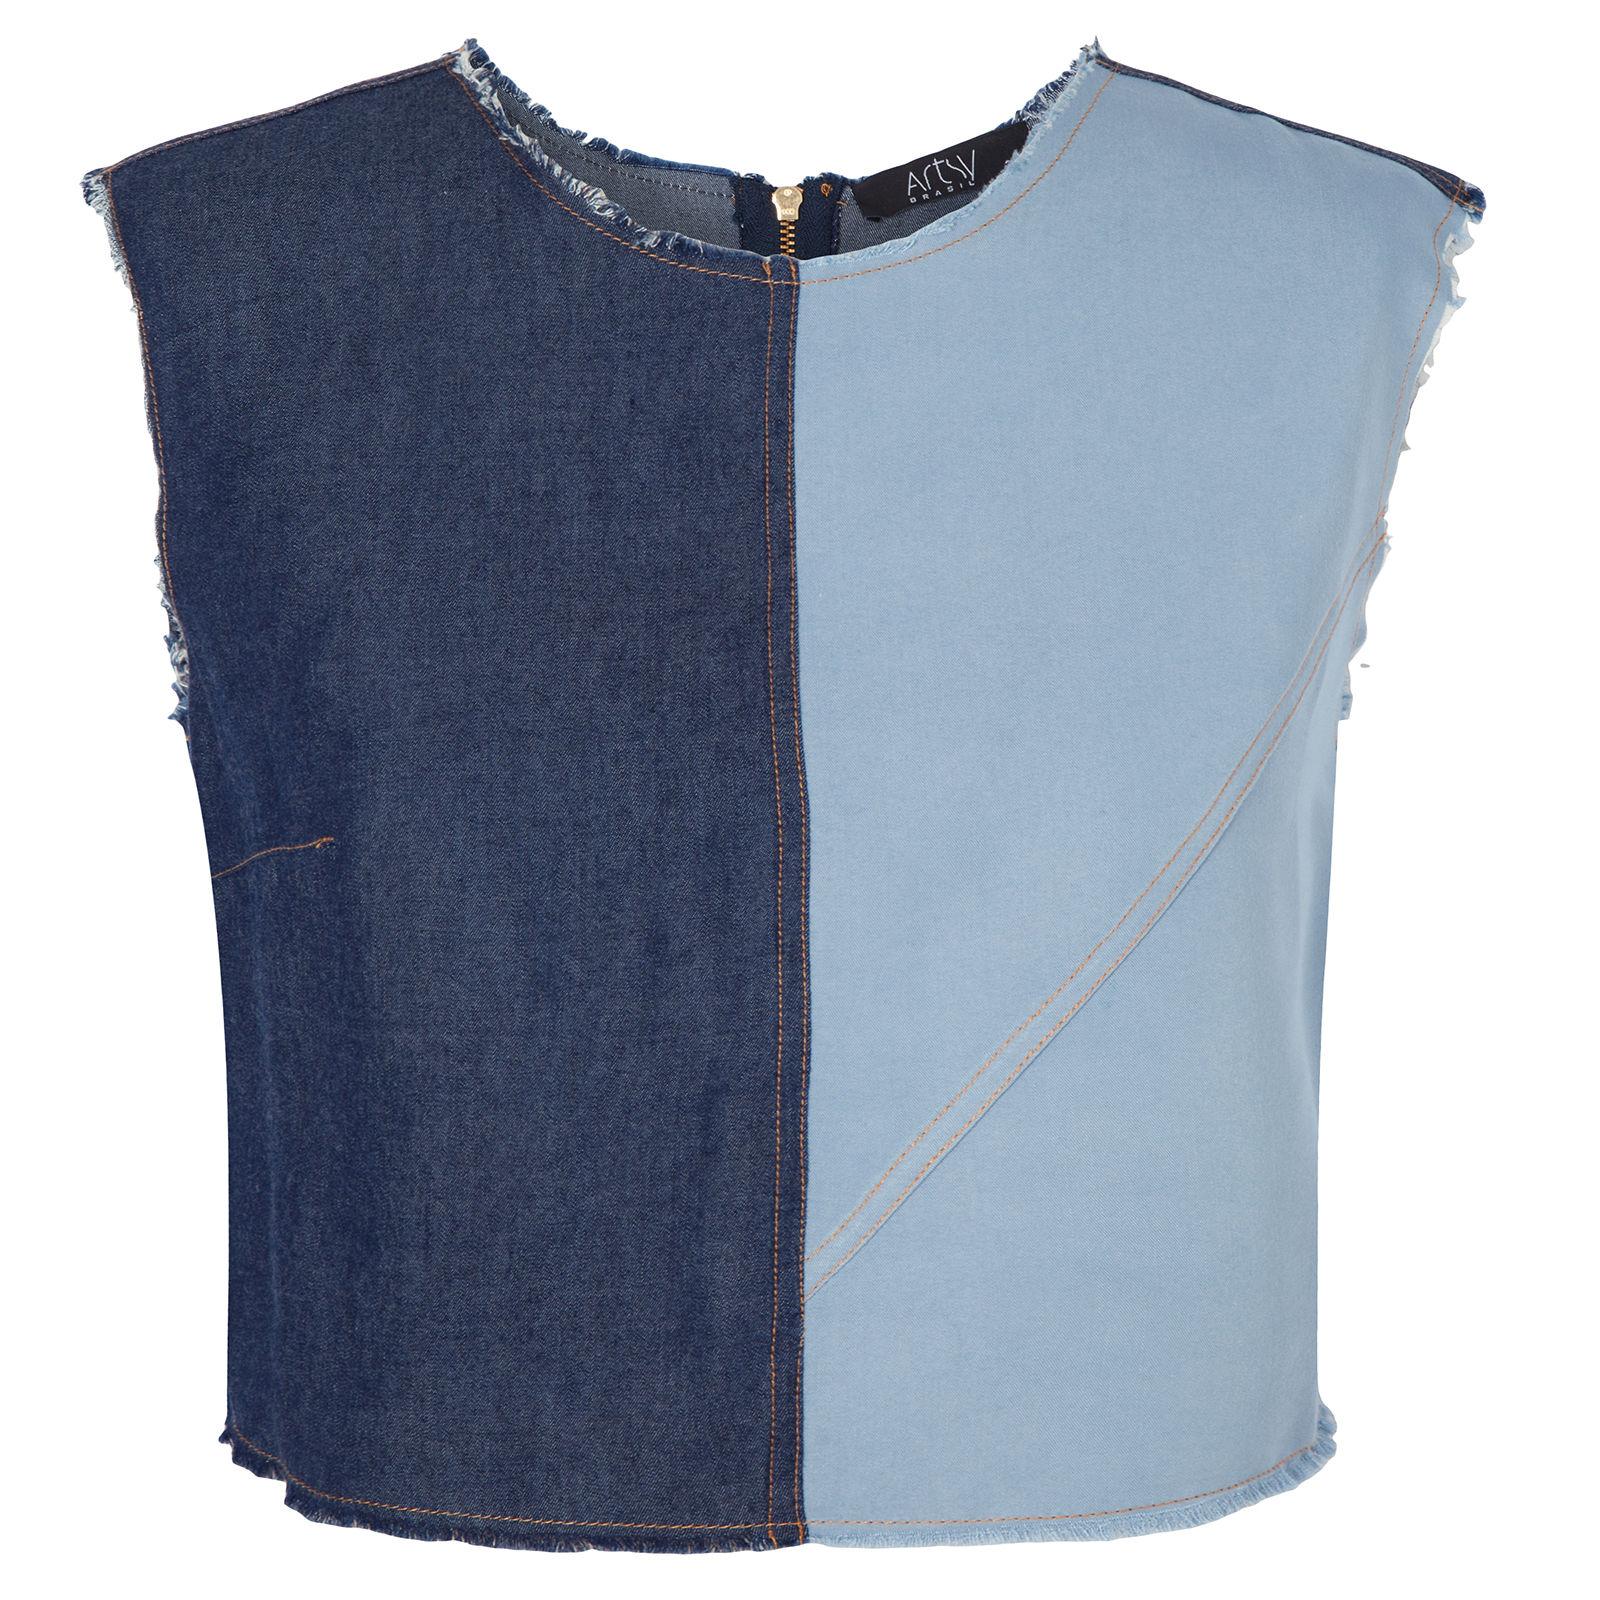 Regata Cropped Jeans Bicolor - Azul